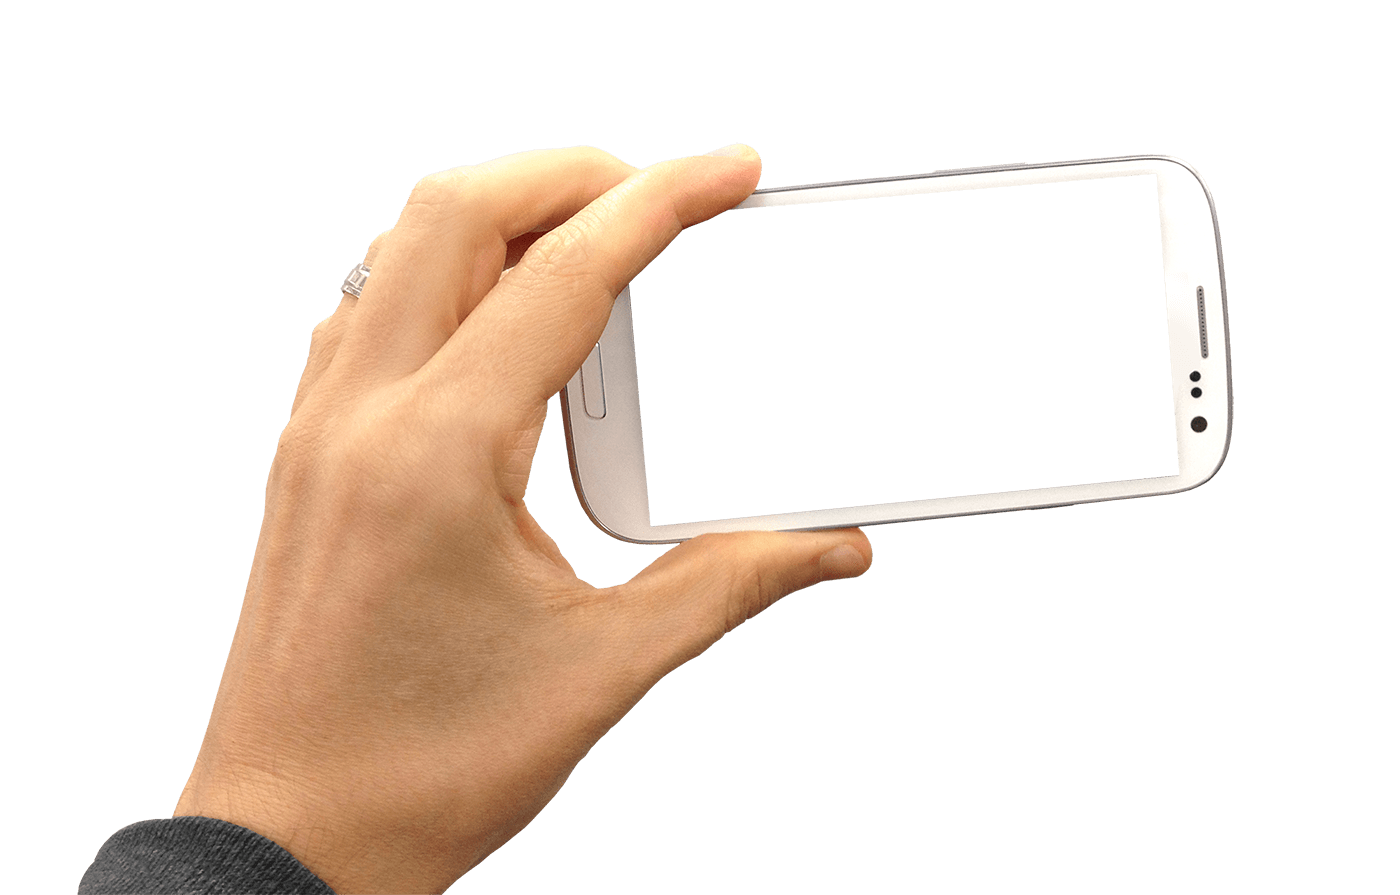 Hand holding landscape transparent. Hands clipart smartphone